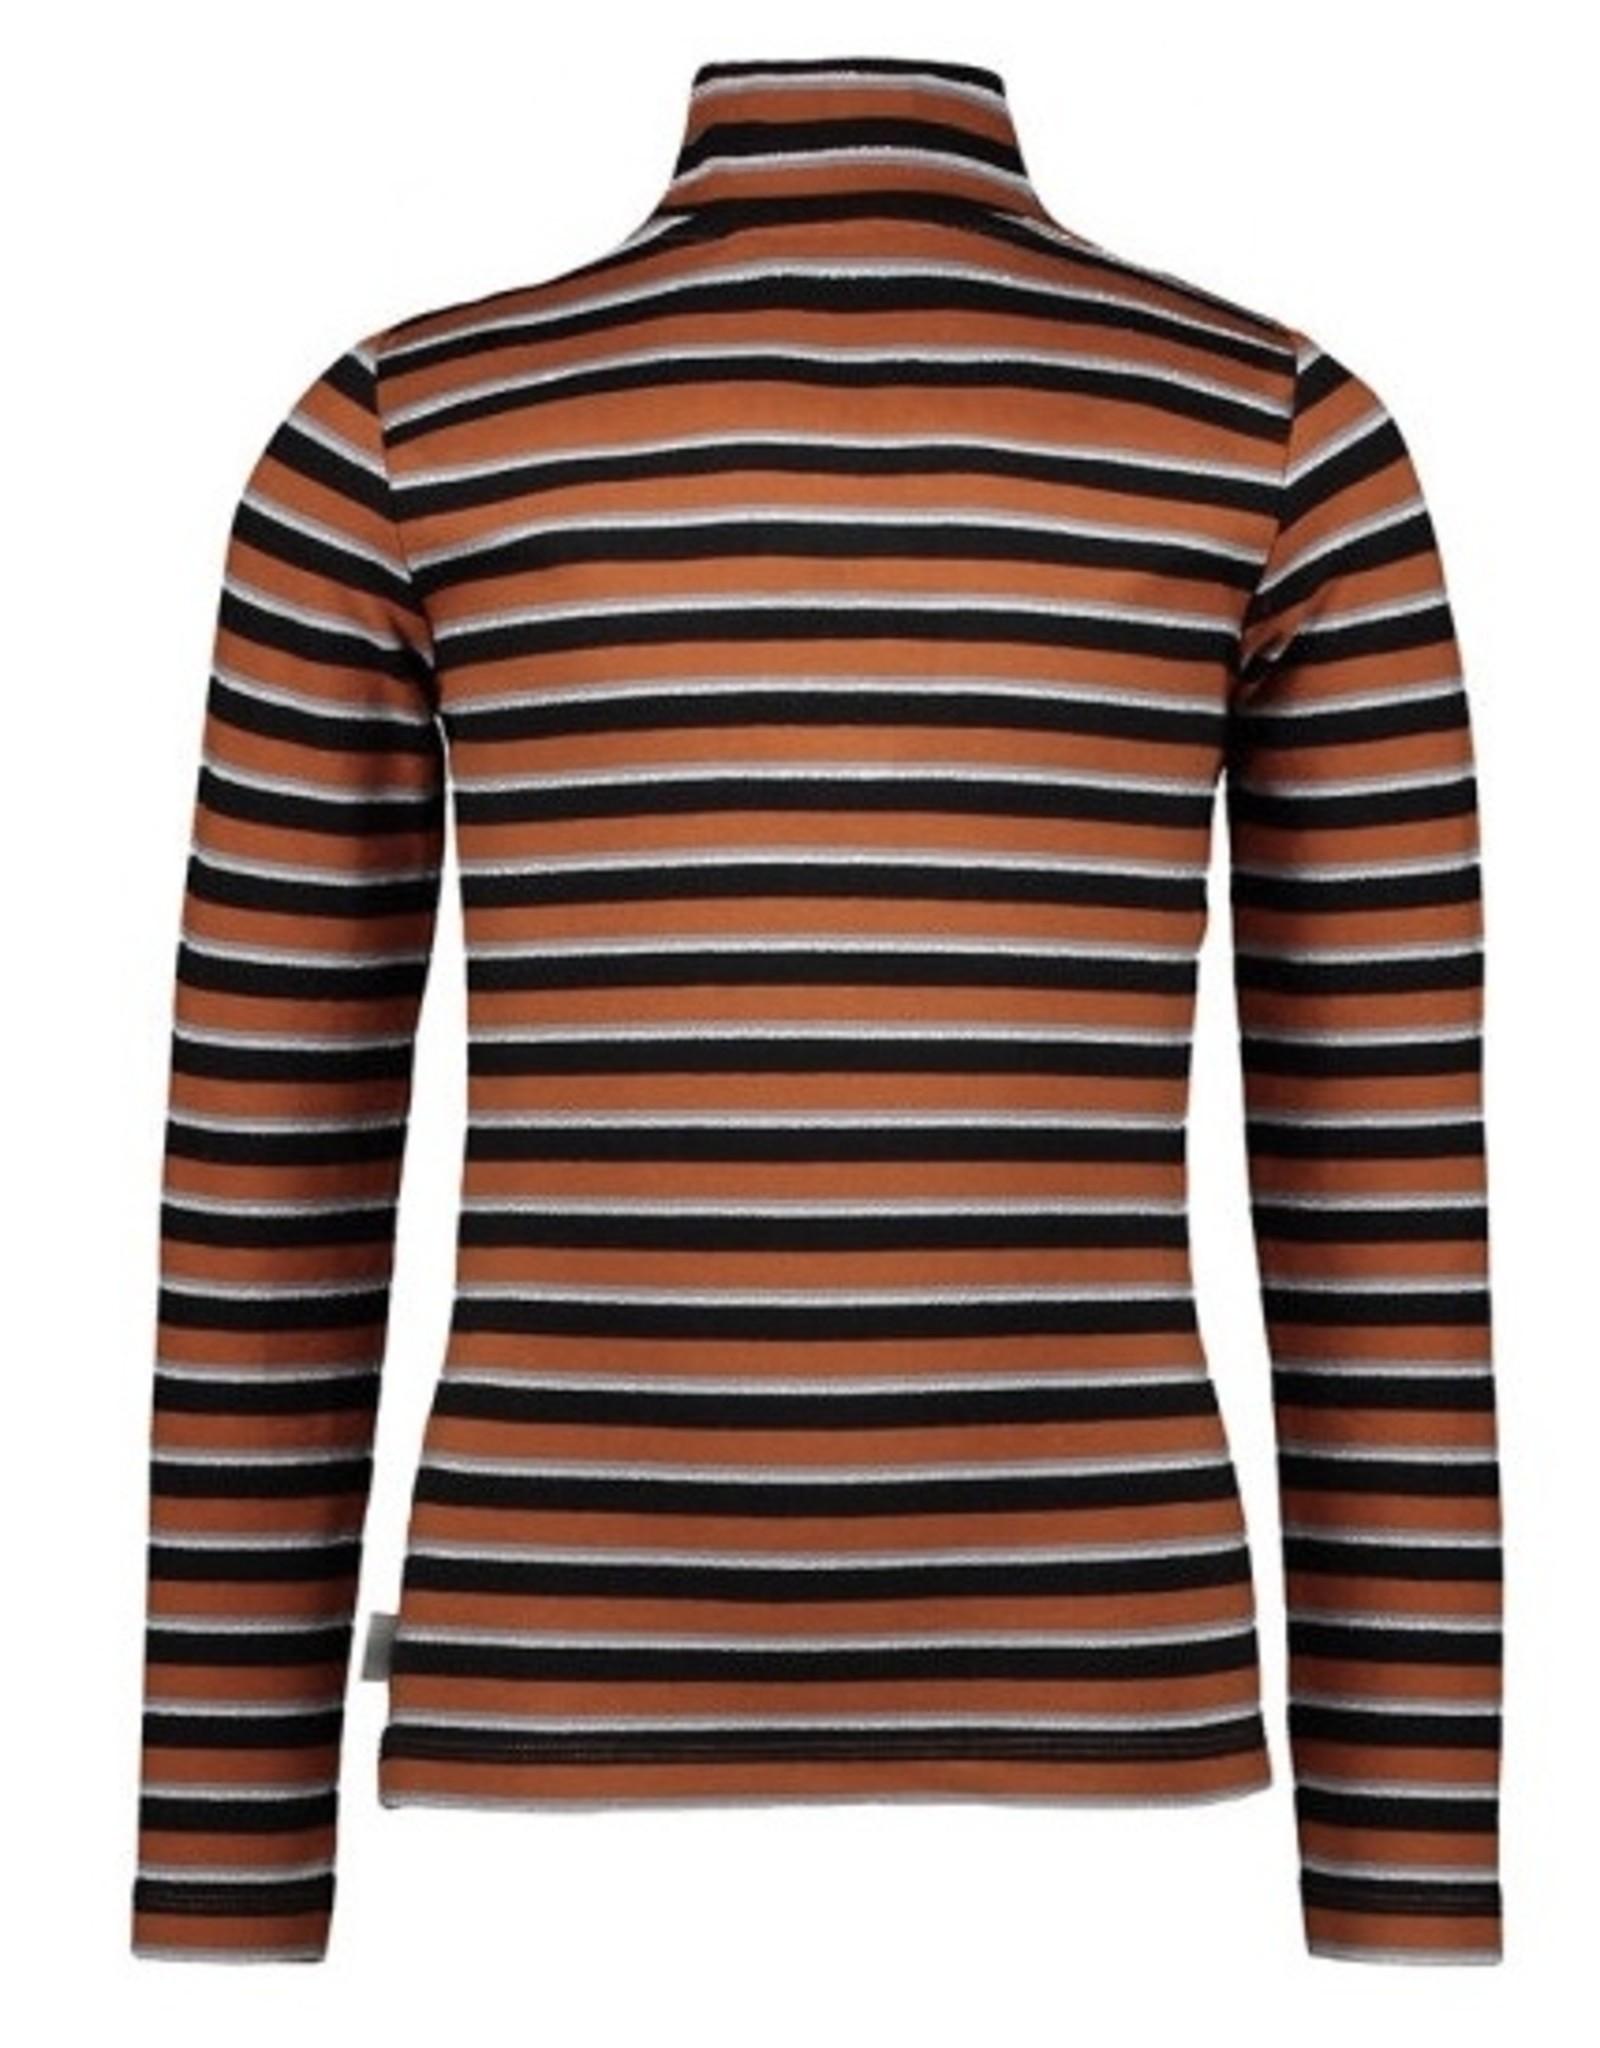 moodstreet M108-5408 T-Shirt